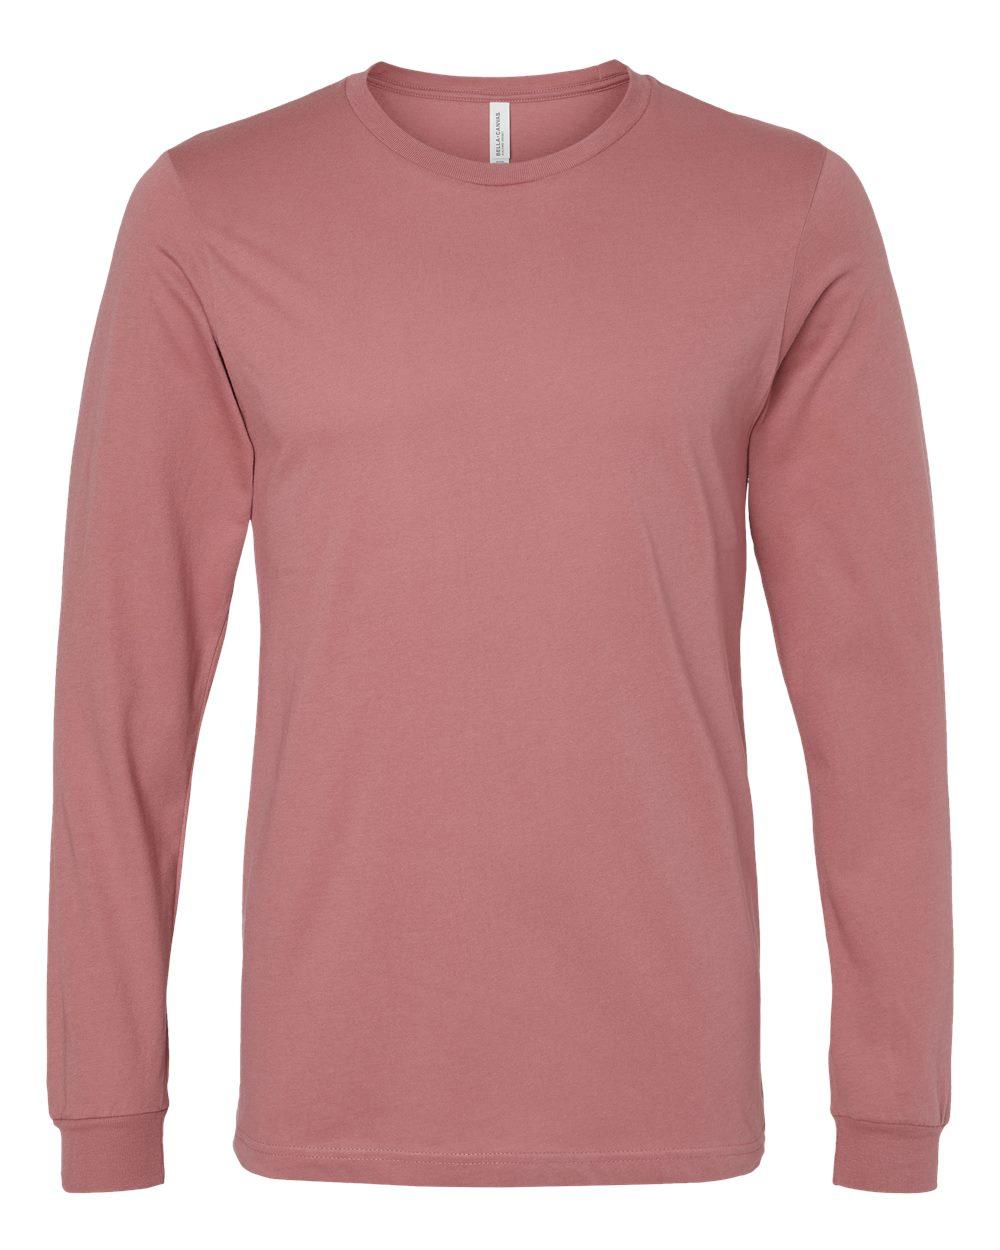 Bella-Canvas-Mens-Blank-Top-Long-Sleeve-Jersey-Tee-T-Shirt-3501-up-to-3XL thumbnail 42